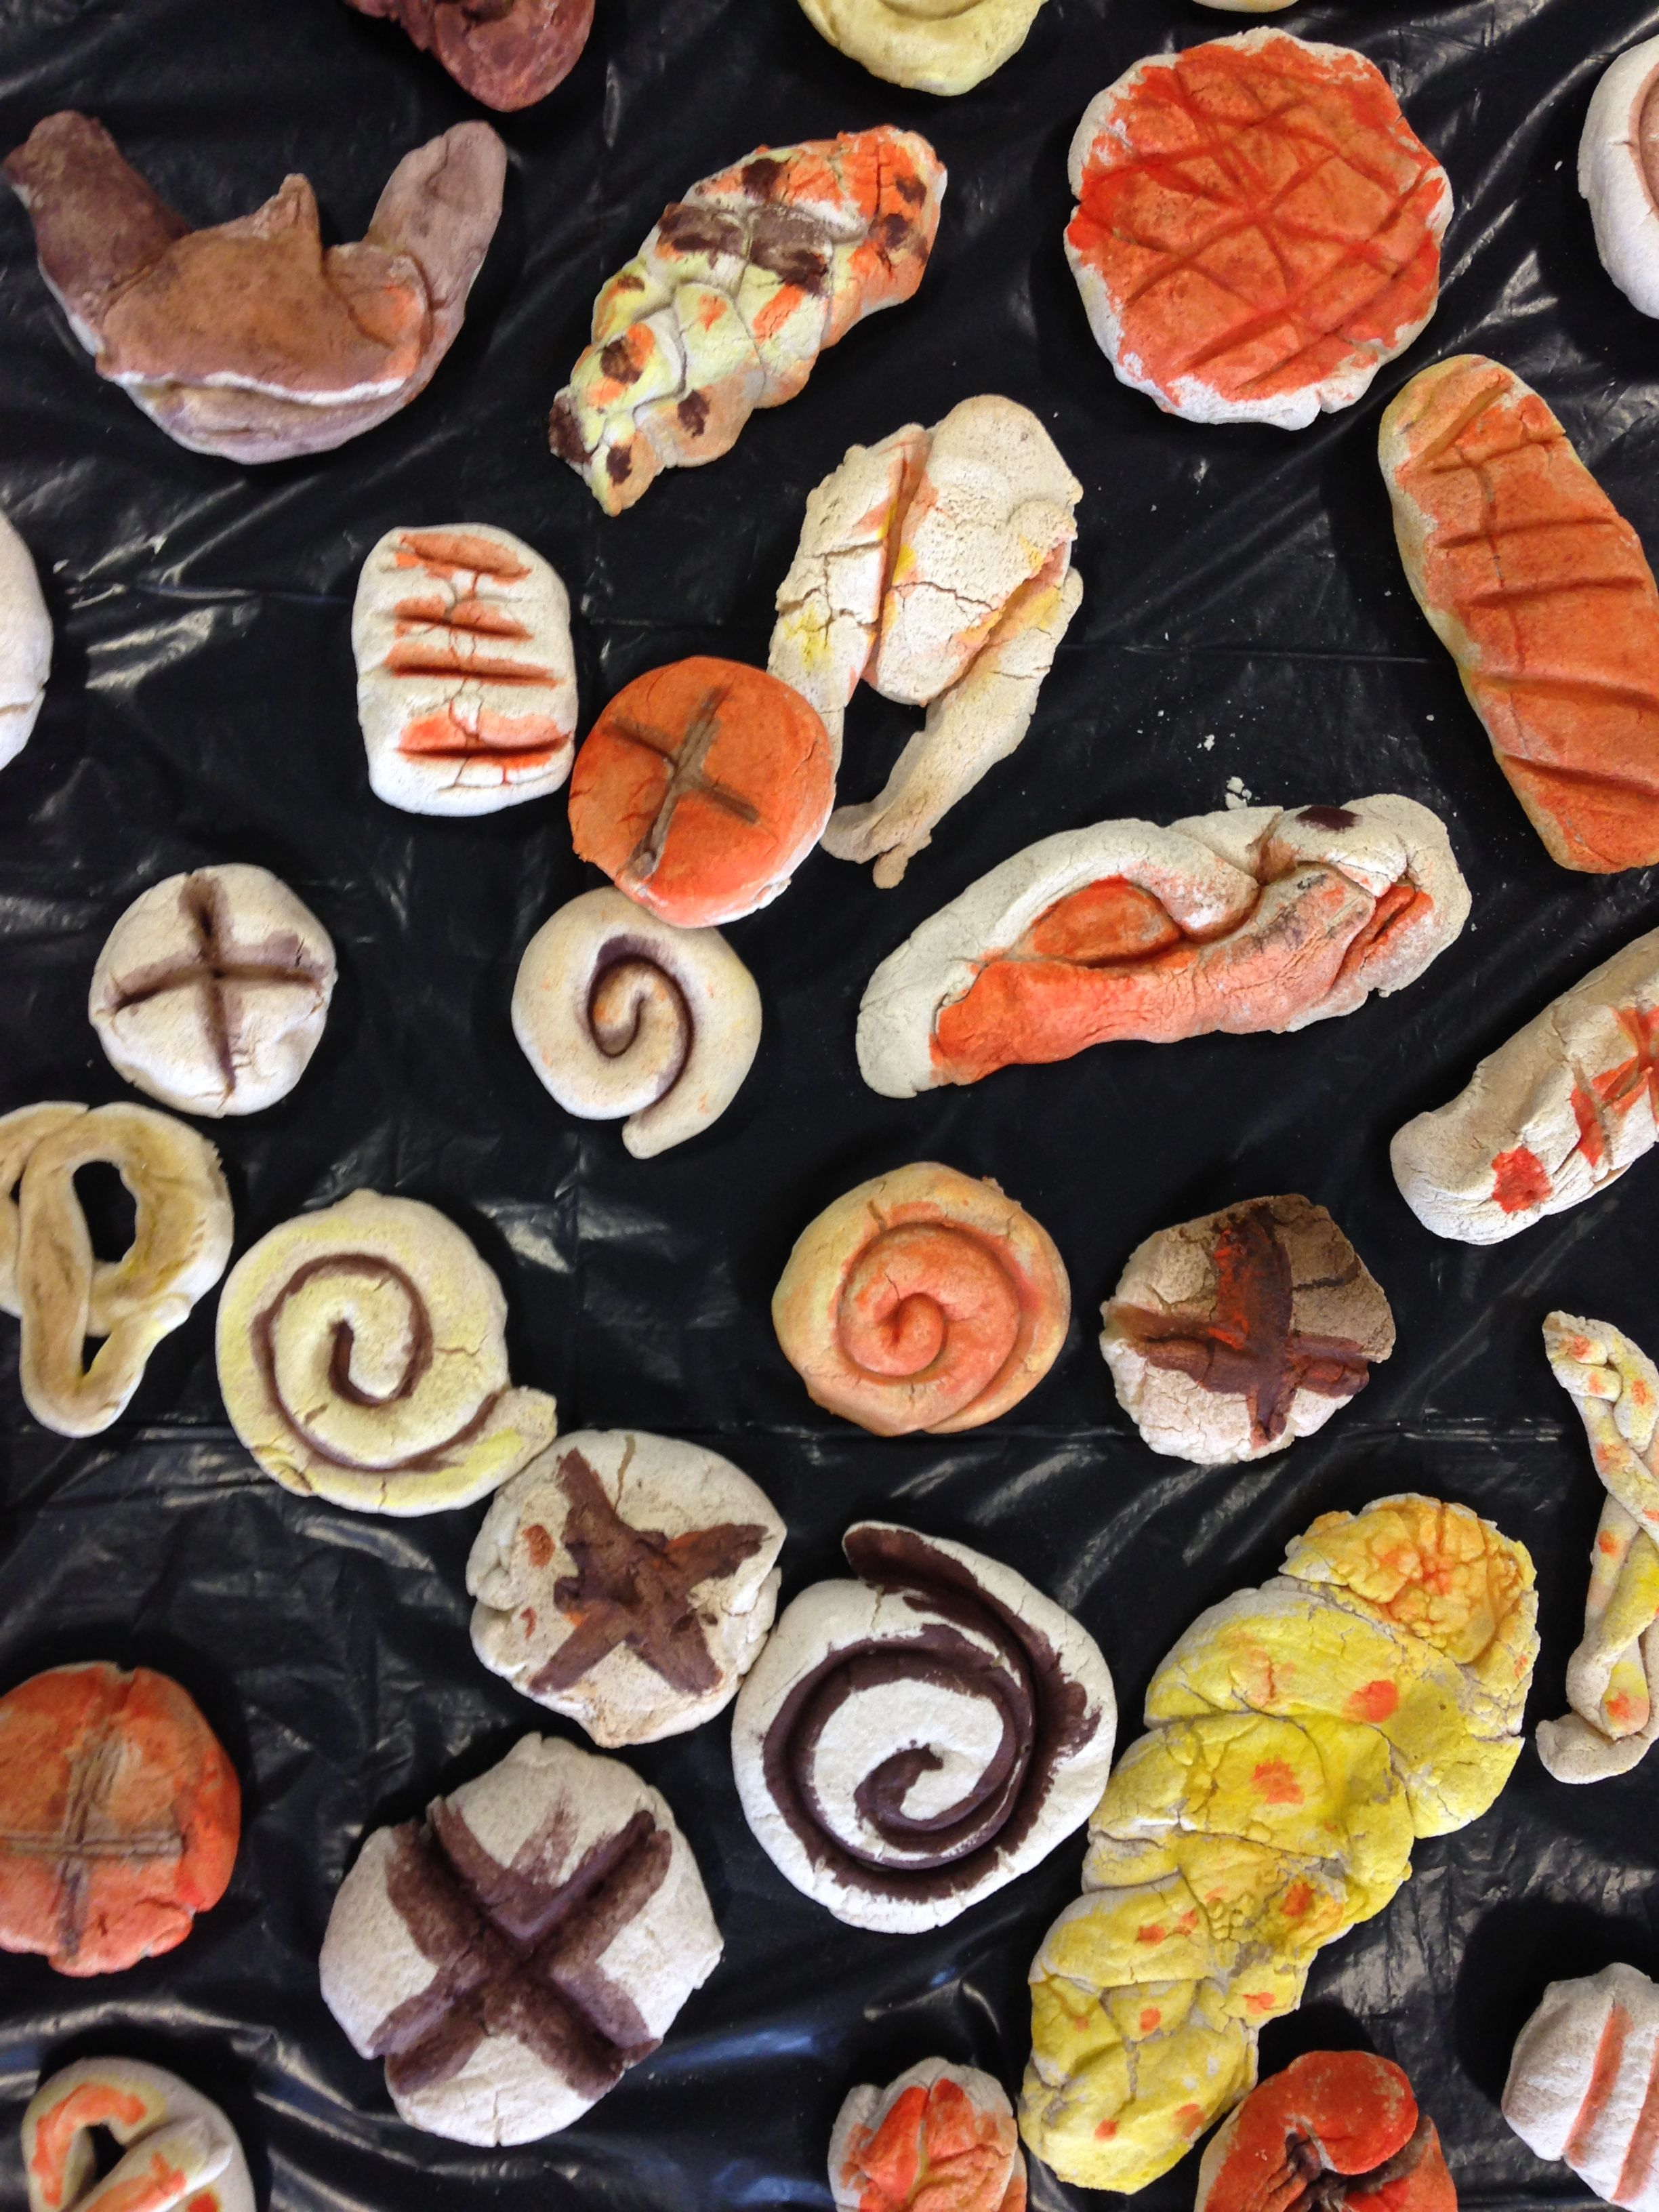 Pudding lane Bakery..close up of salt dough bread rolls..